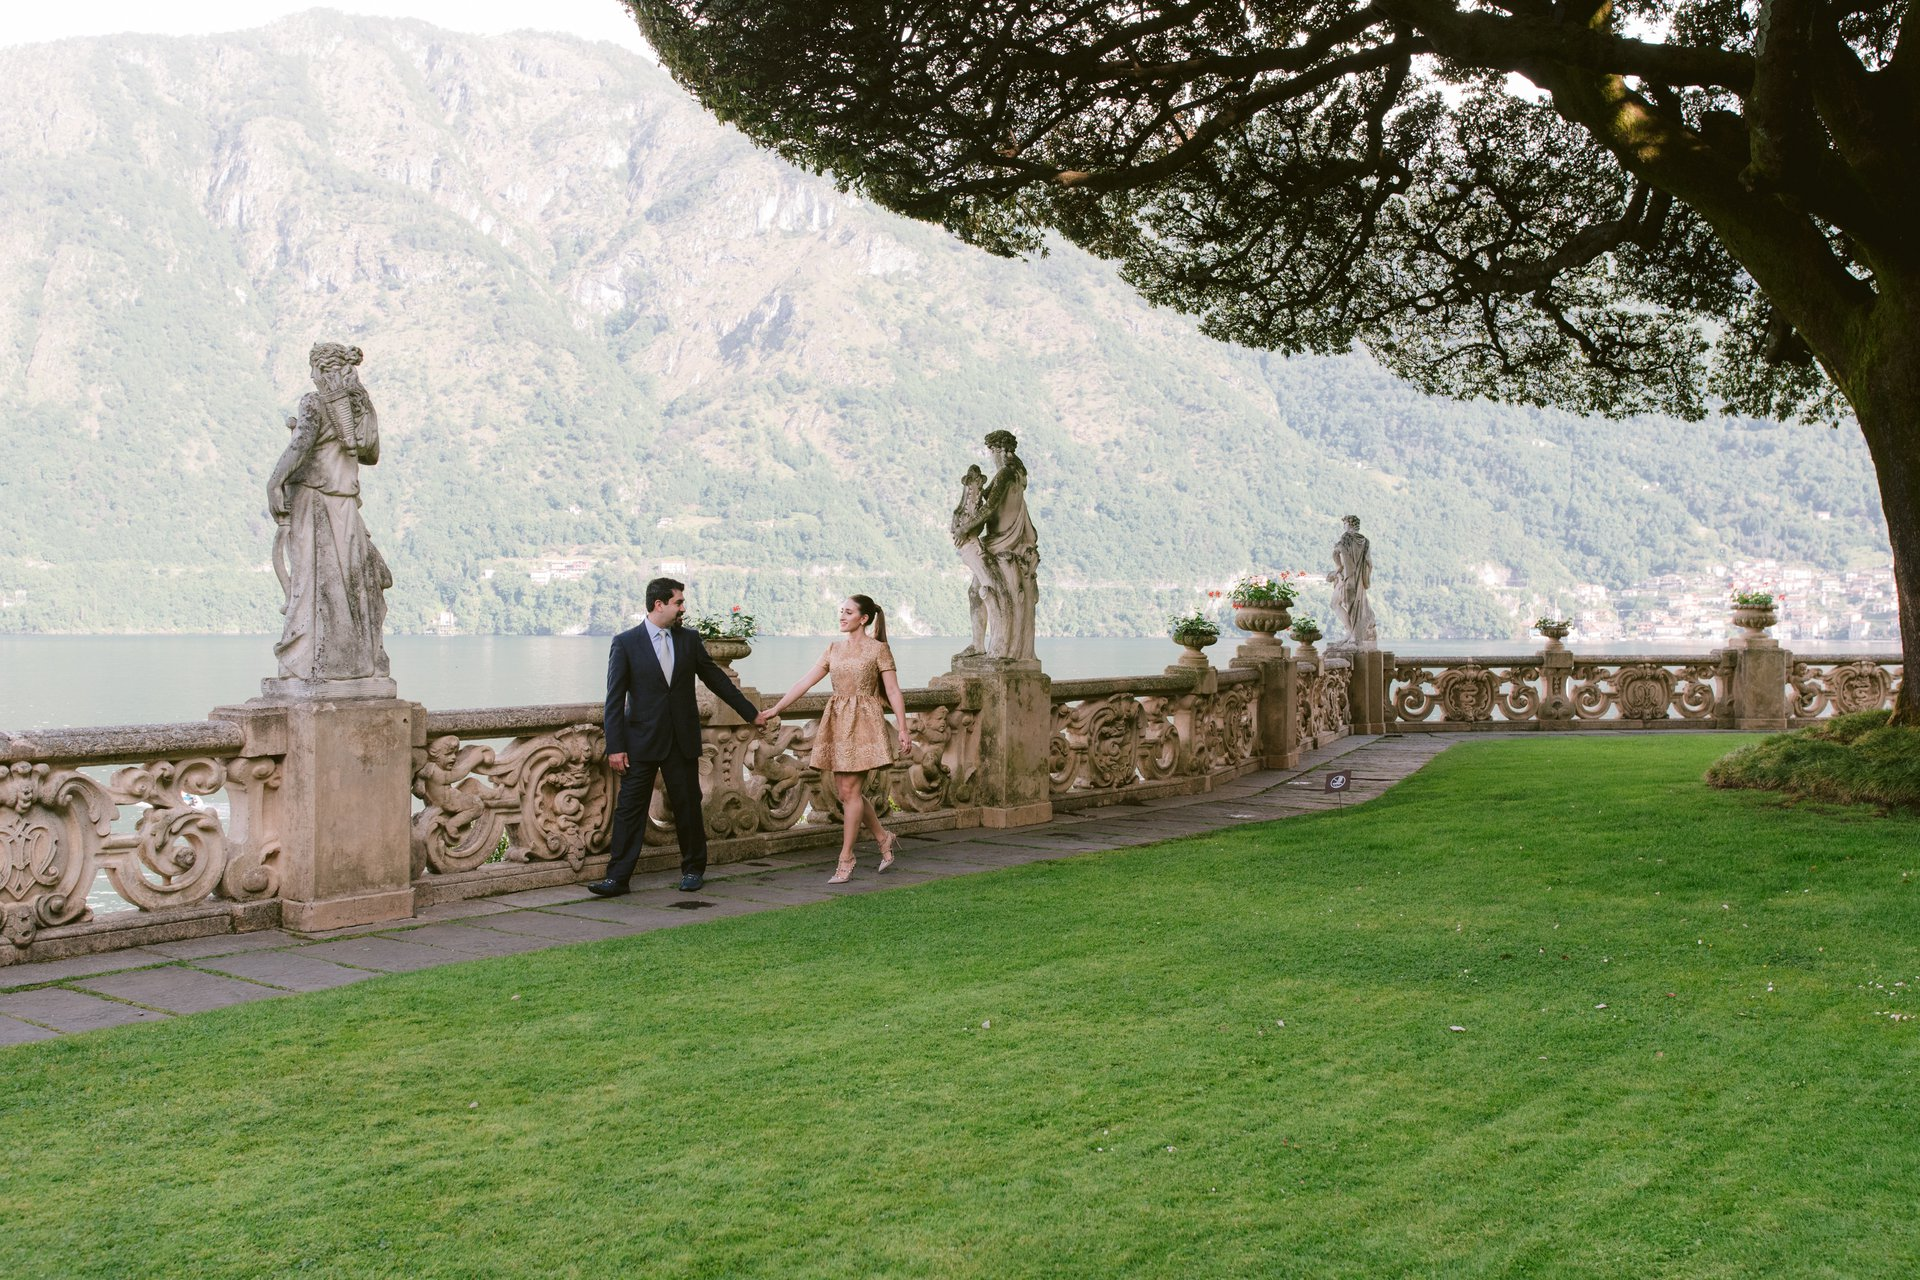 Lake Como-Italy-travel-story-Flytographer-37